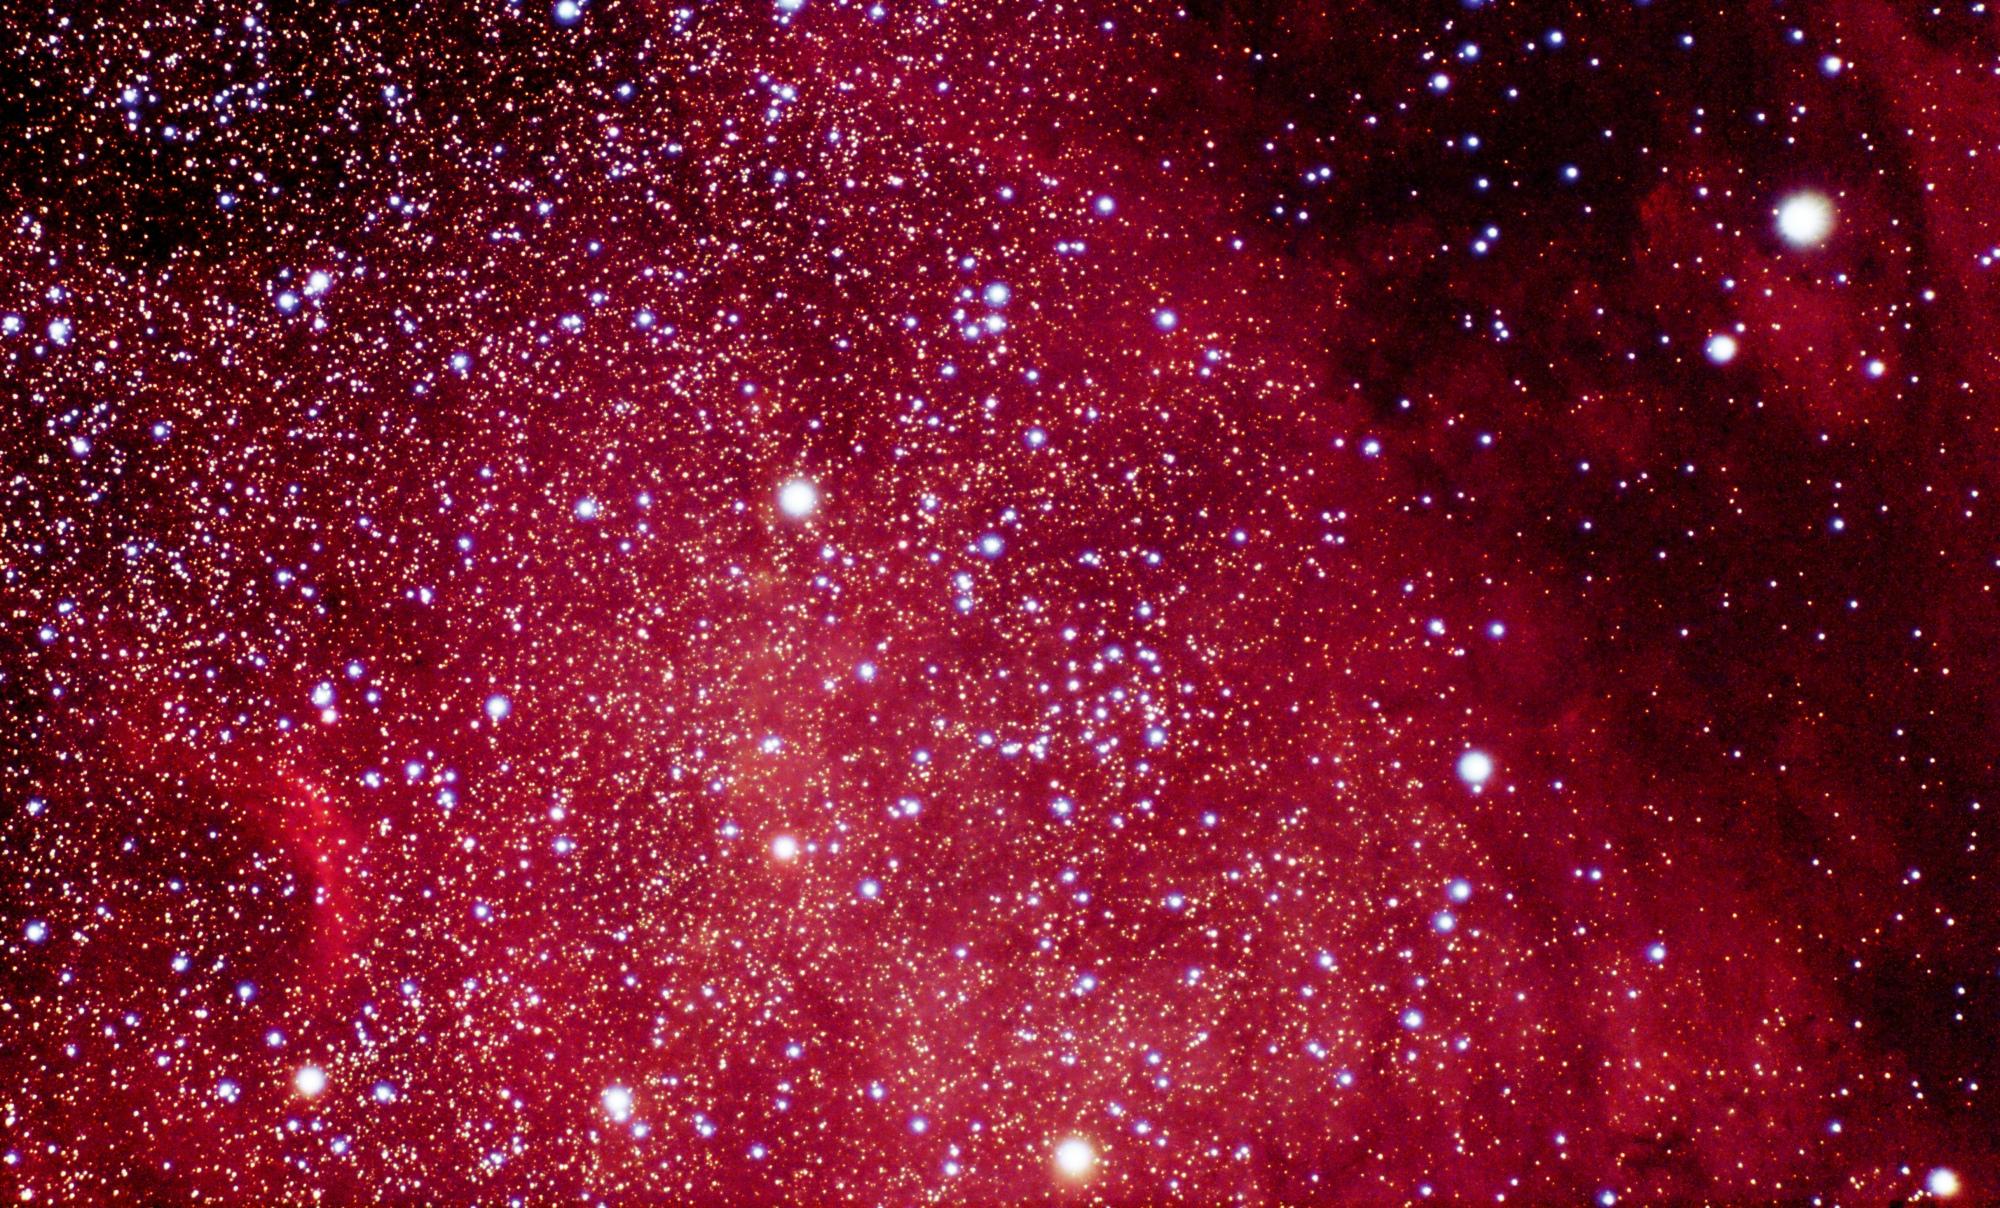 NGC7000_finale.thumb.jpg.c06d903bcf3d1e7b6ef5222fa4629746.jpg